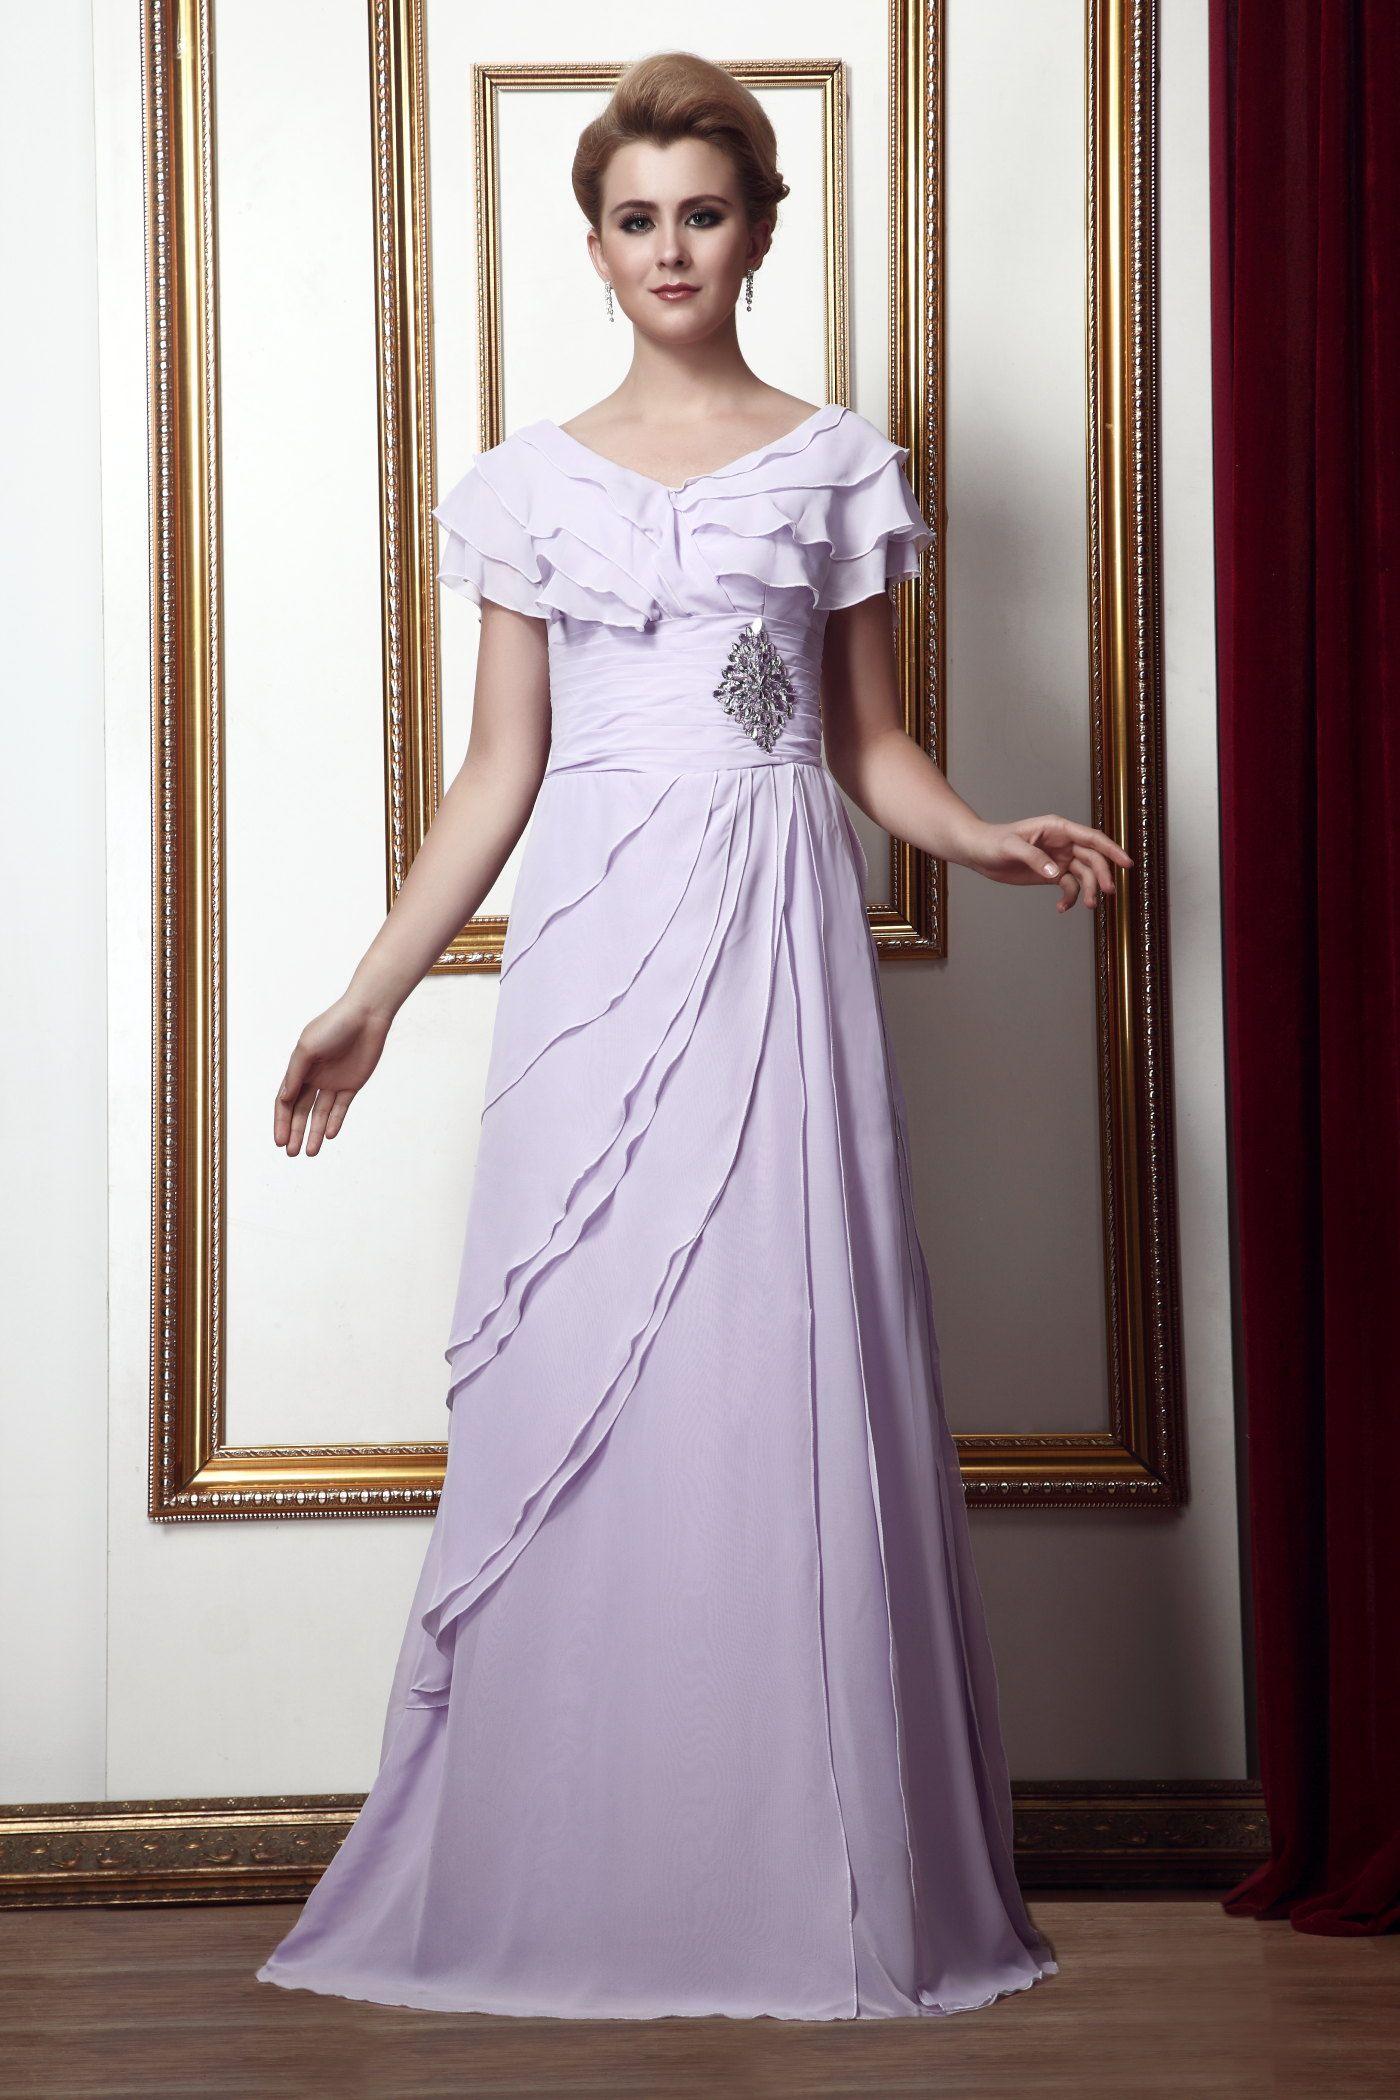 Short sleeve dresses for wedding guests  mubridal SUPPLIES Short Sleeves Elegant u Luxurious Aline